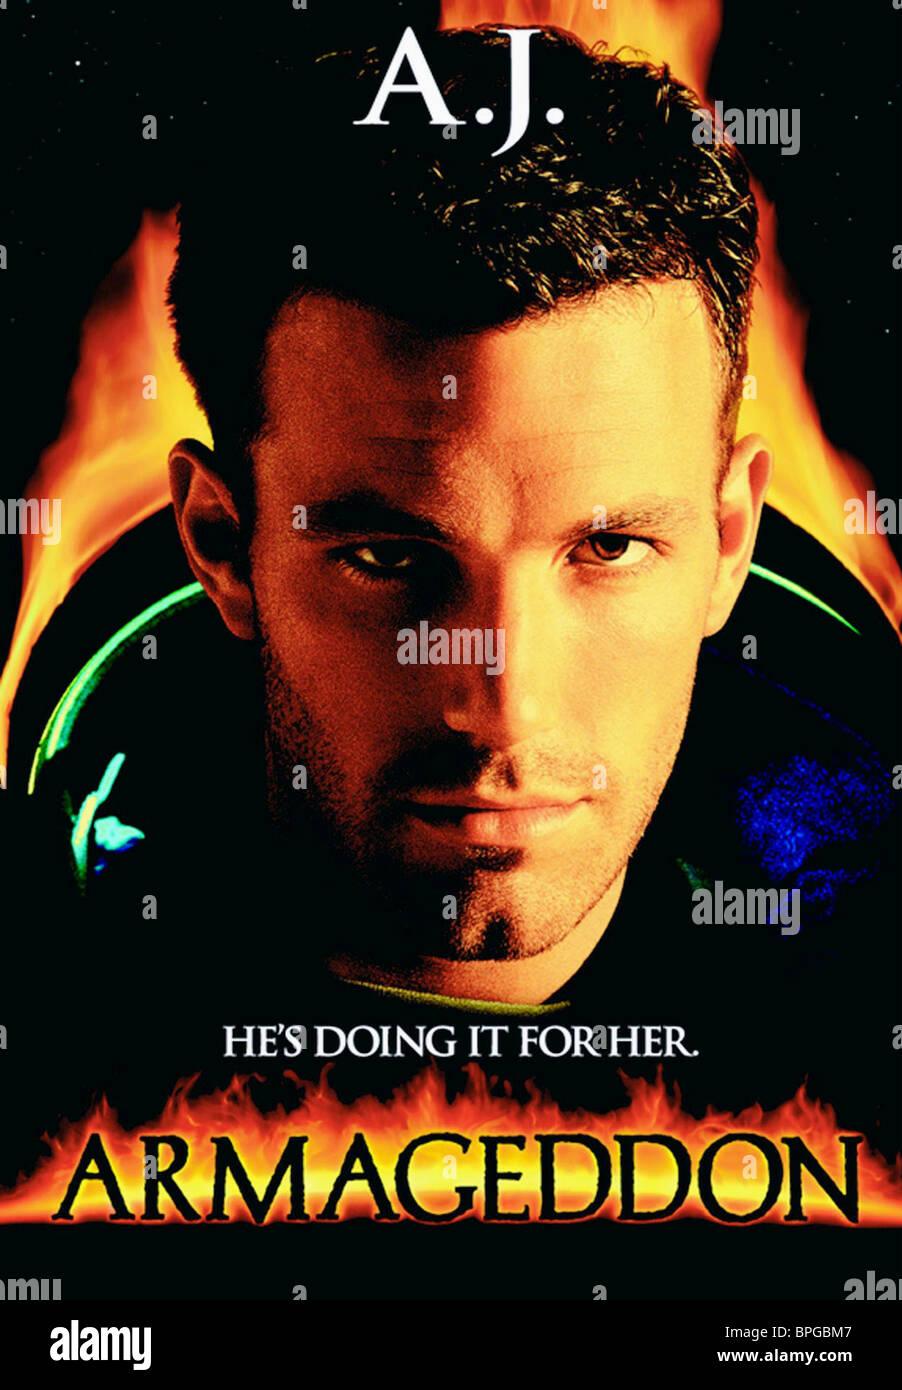 Ben Affleck Armageddon 1998 Stock Photo Alamy